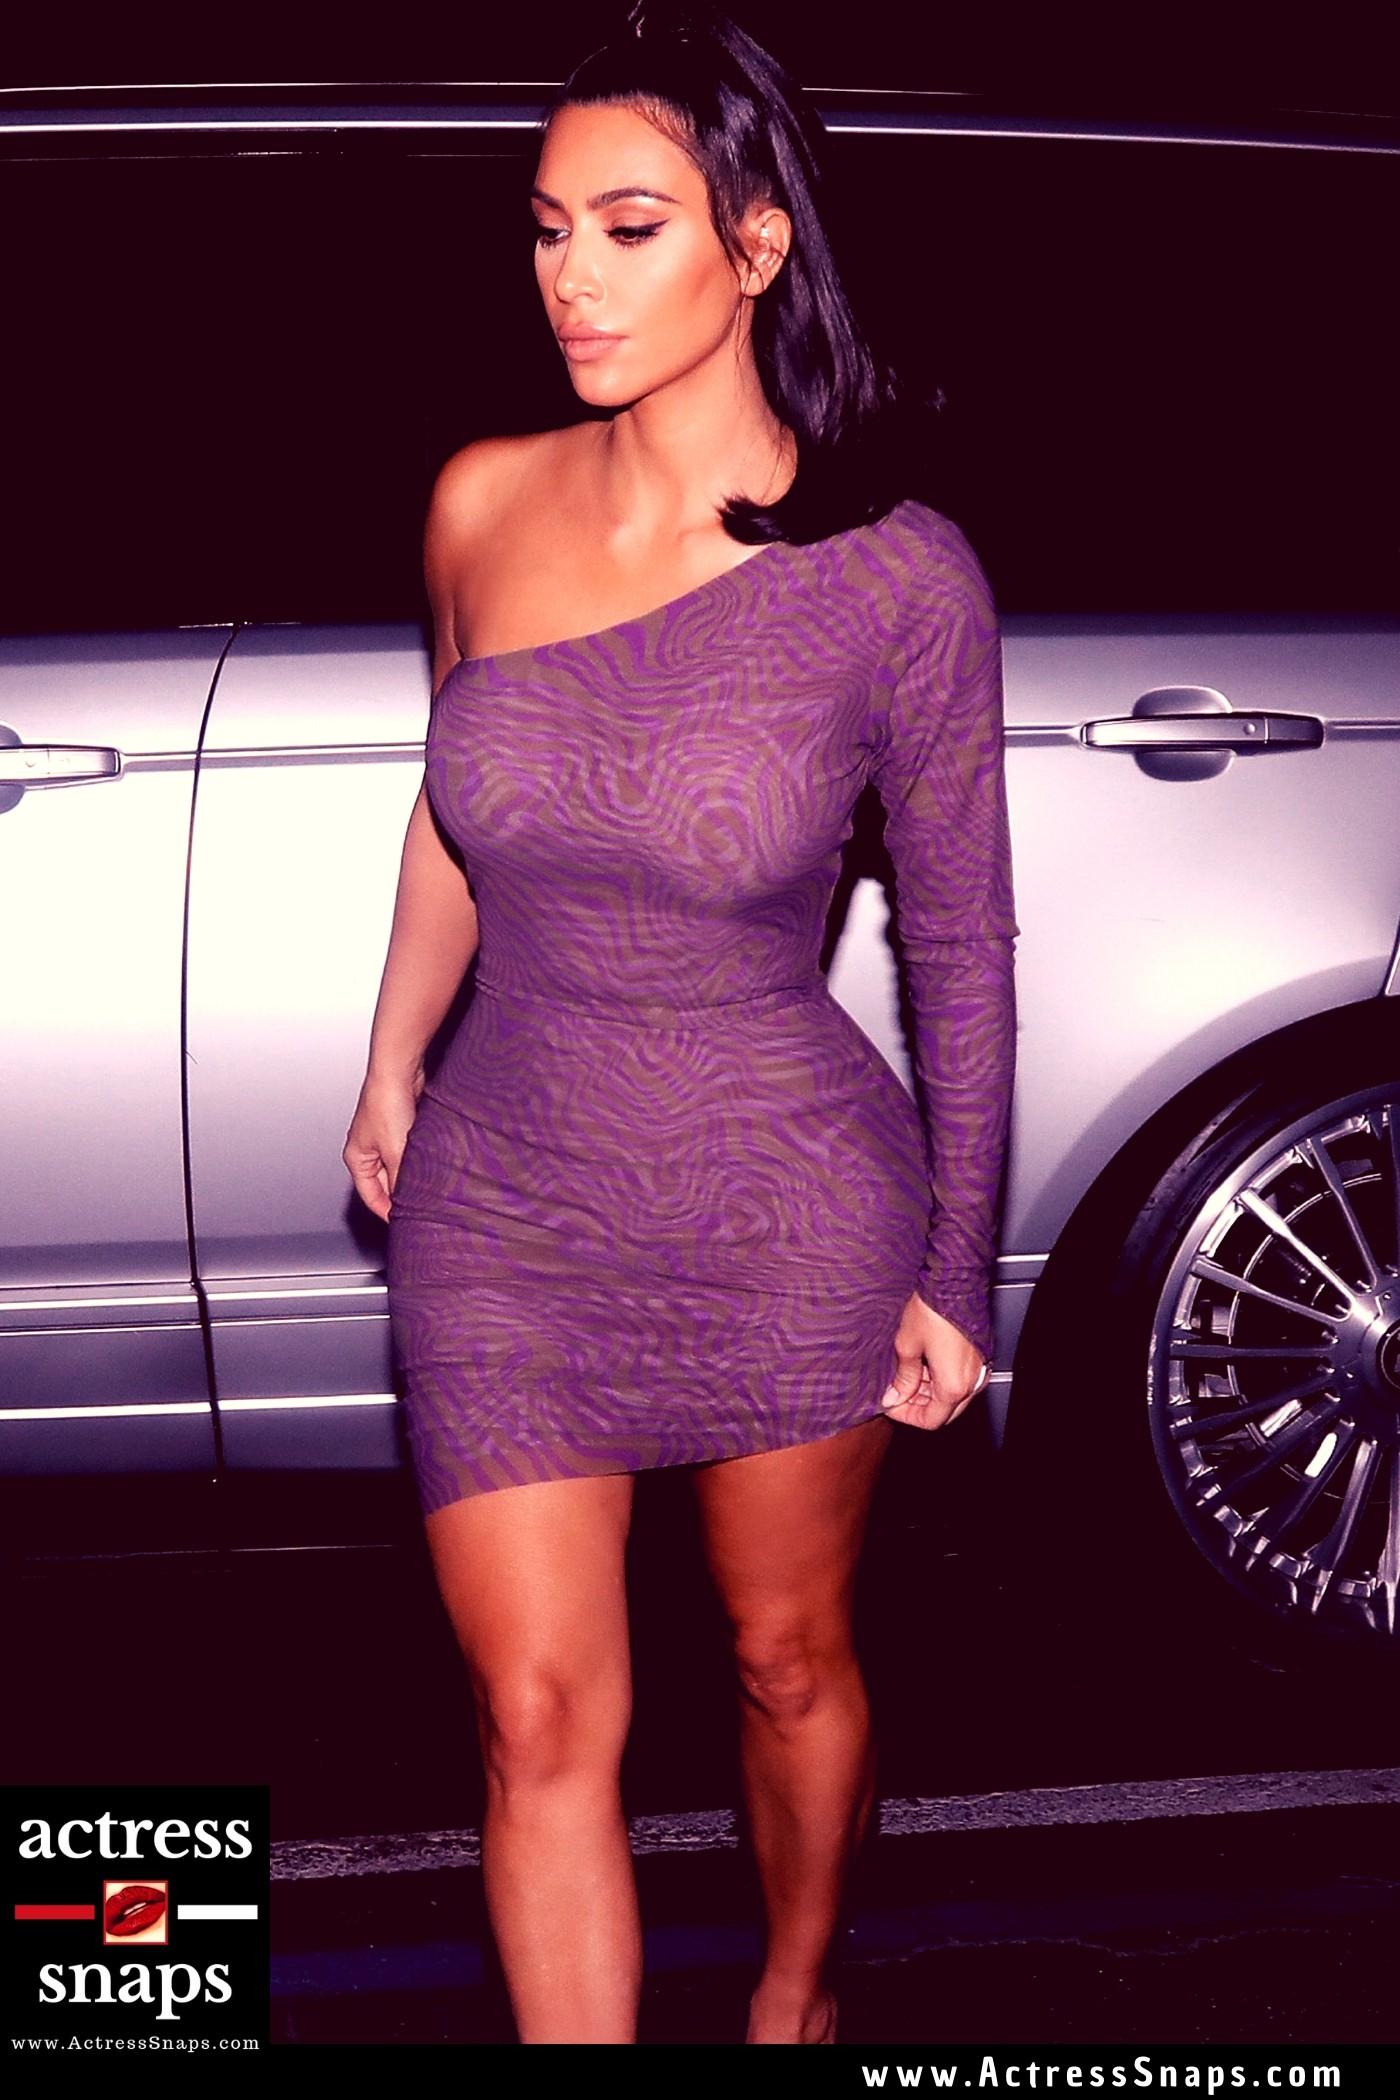 Kim Kardashian - Latest Sexy Photos - Sexy Actress Pictures | Hot Actress Pictures - ActressSnaps.com